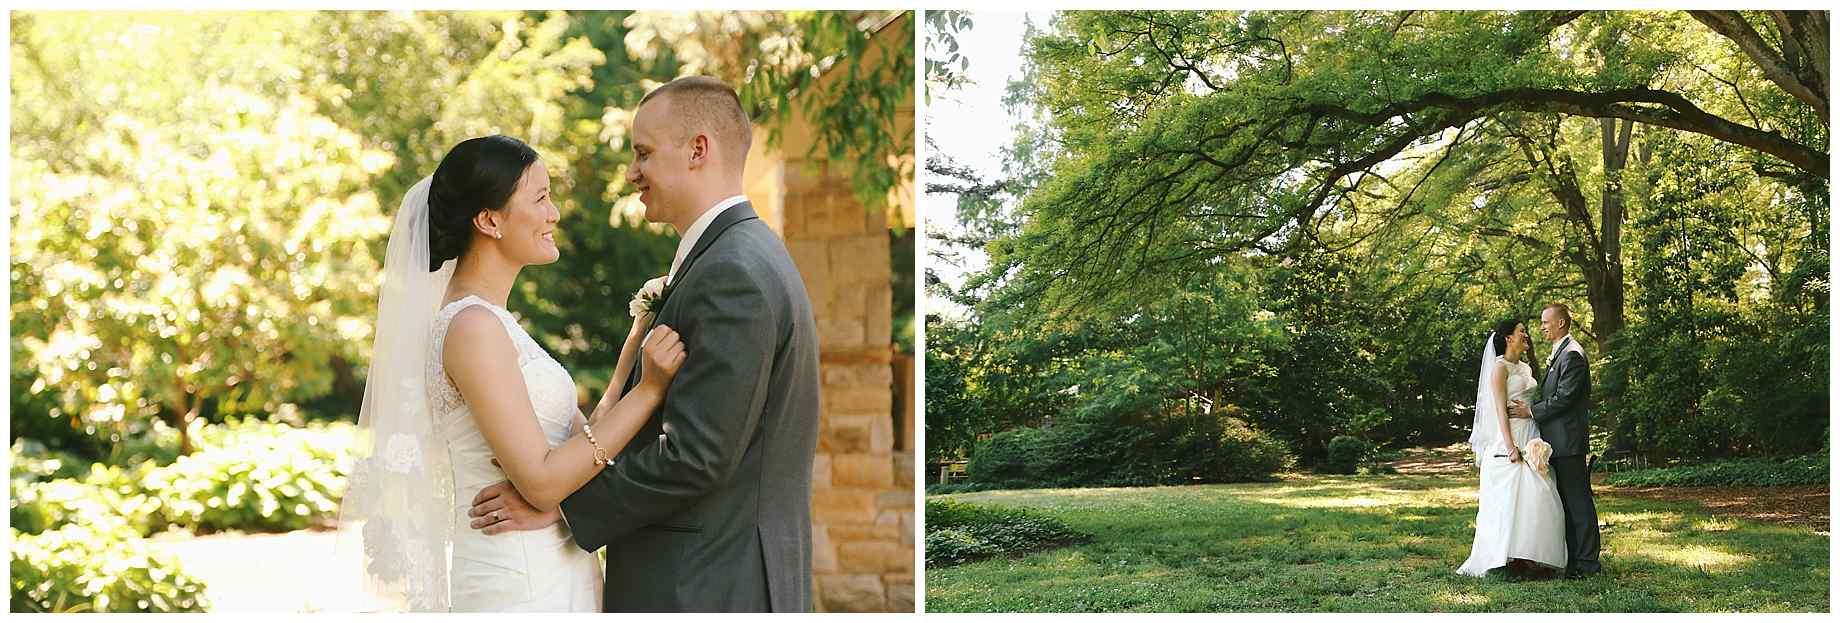 harvard-wedding-photography-23